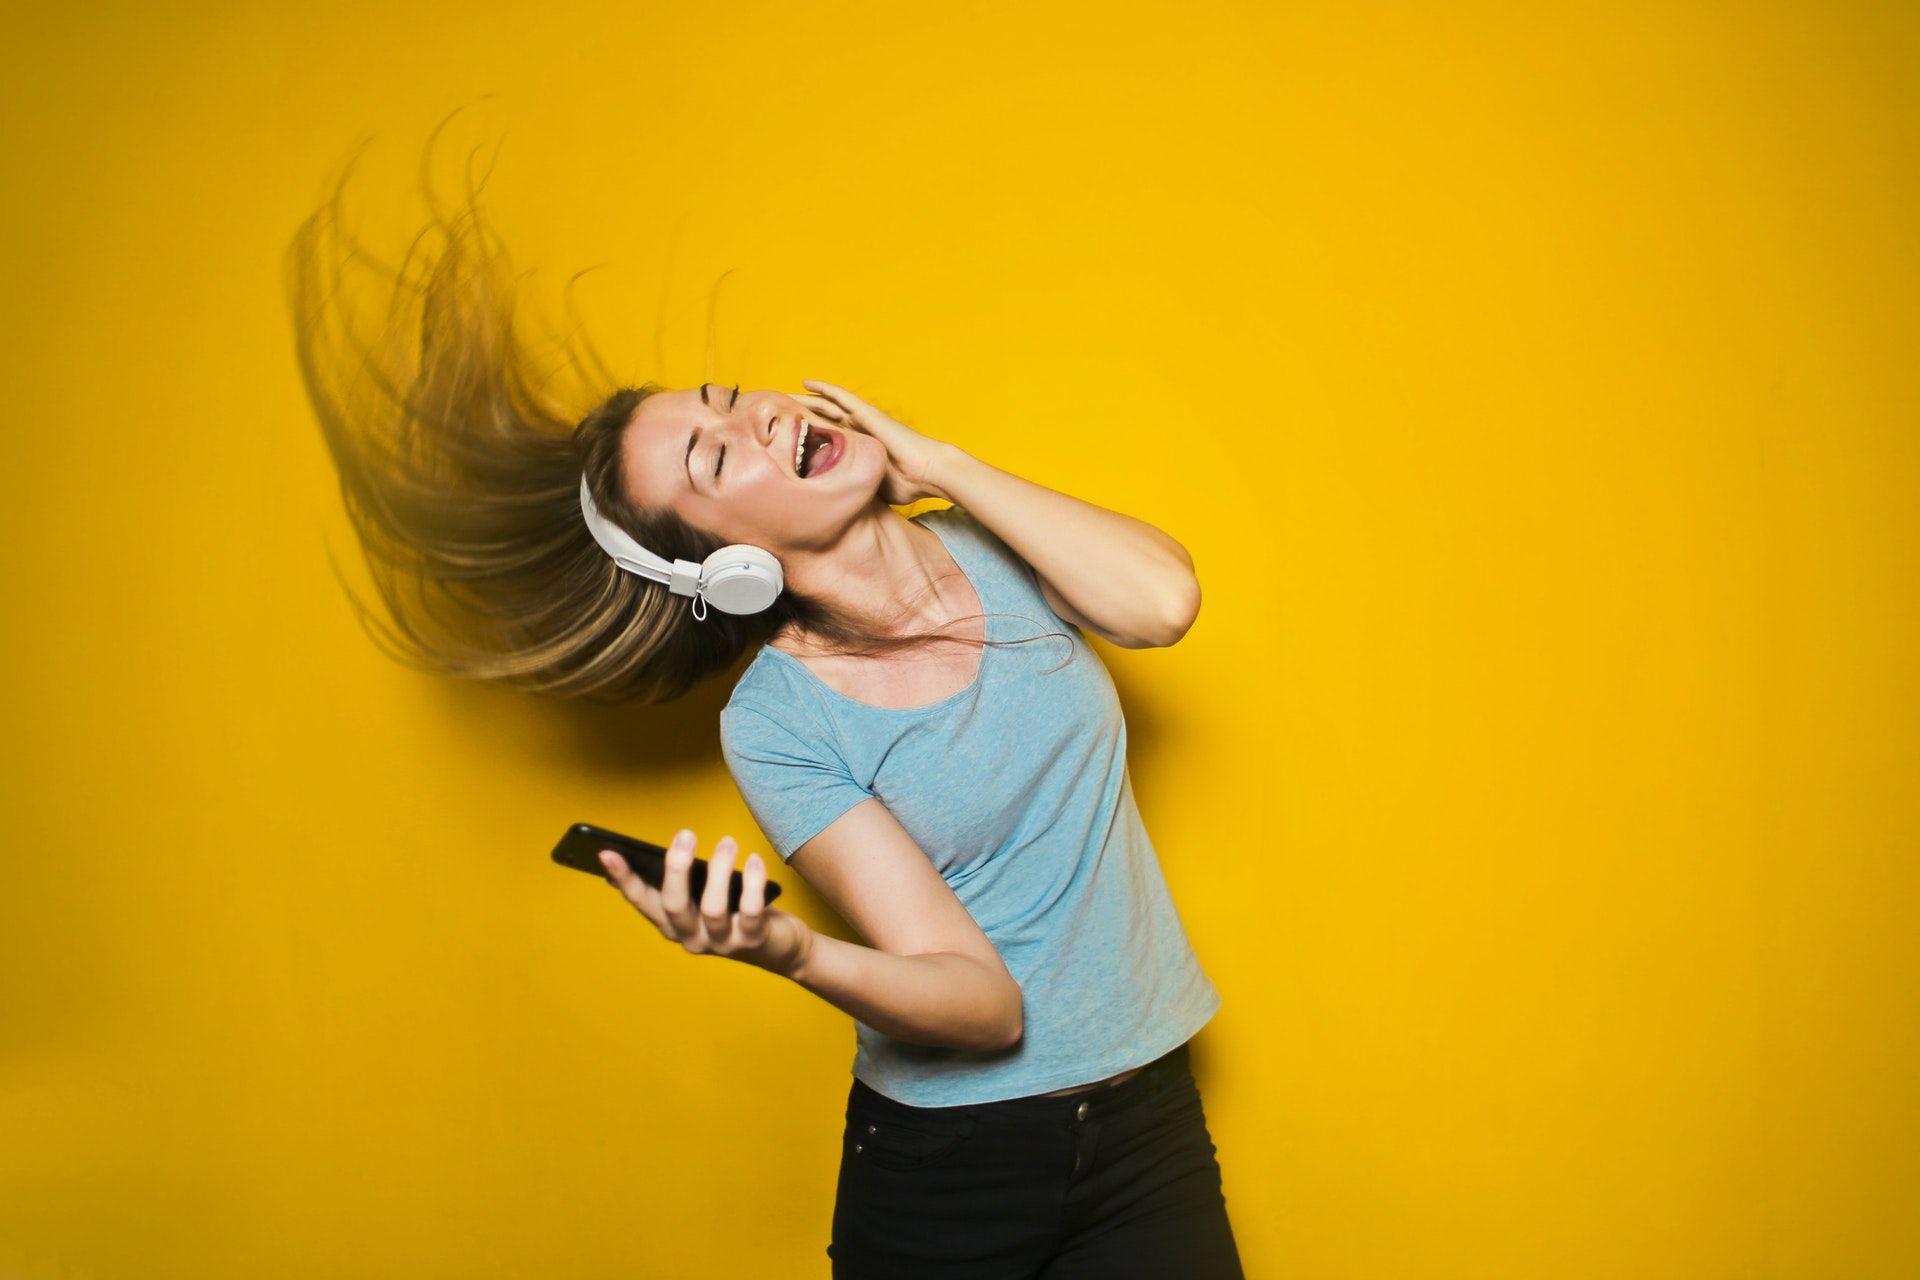 عکس زمینه گوش دادن به موسیقی پس زمینه